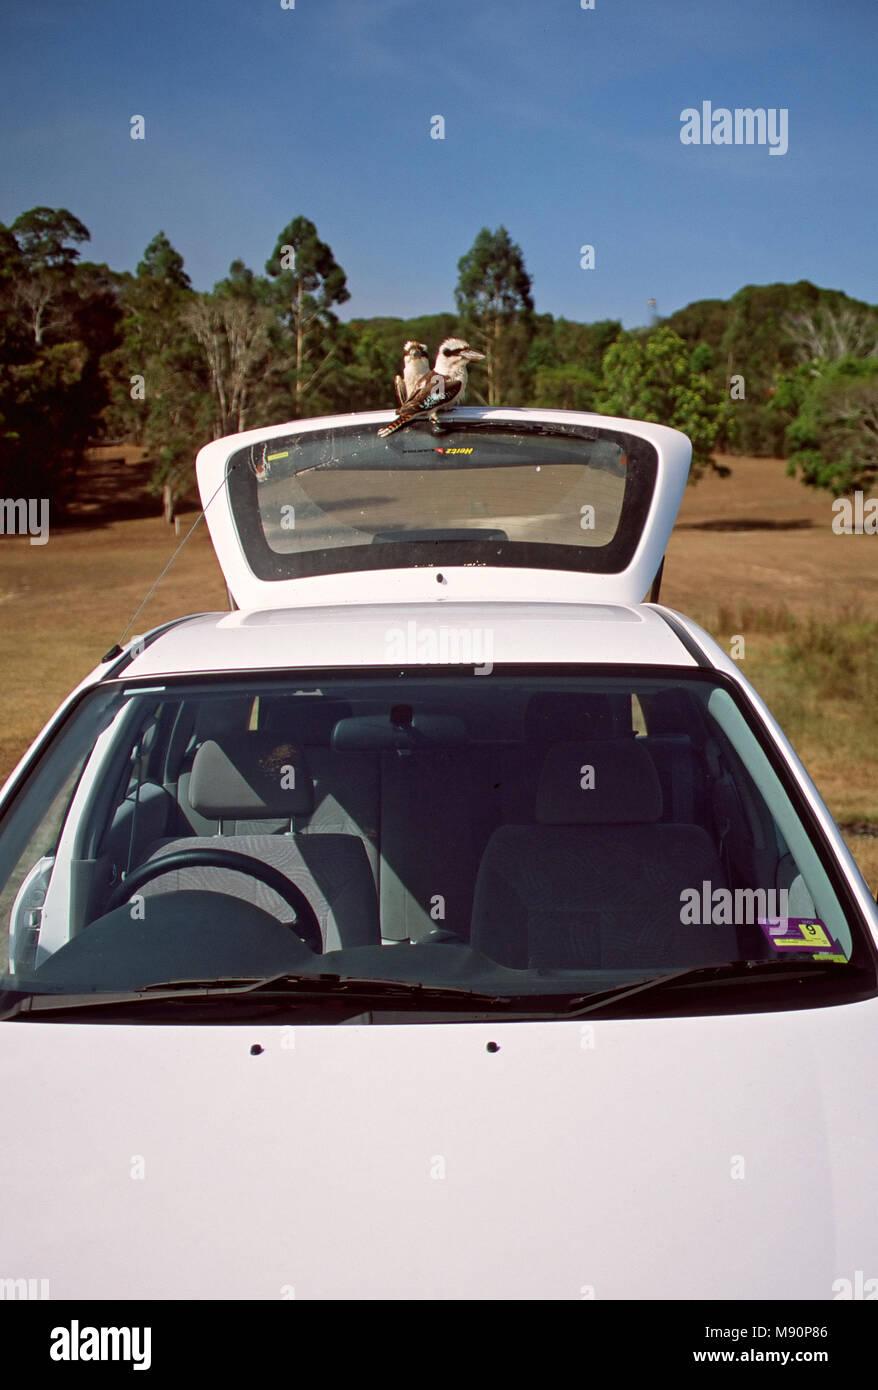 Kookaburra twee vogels zittend op auto Australie, Laughing Kookaburra two birds sitting on car Australia - Stock Image